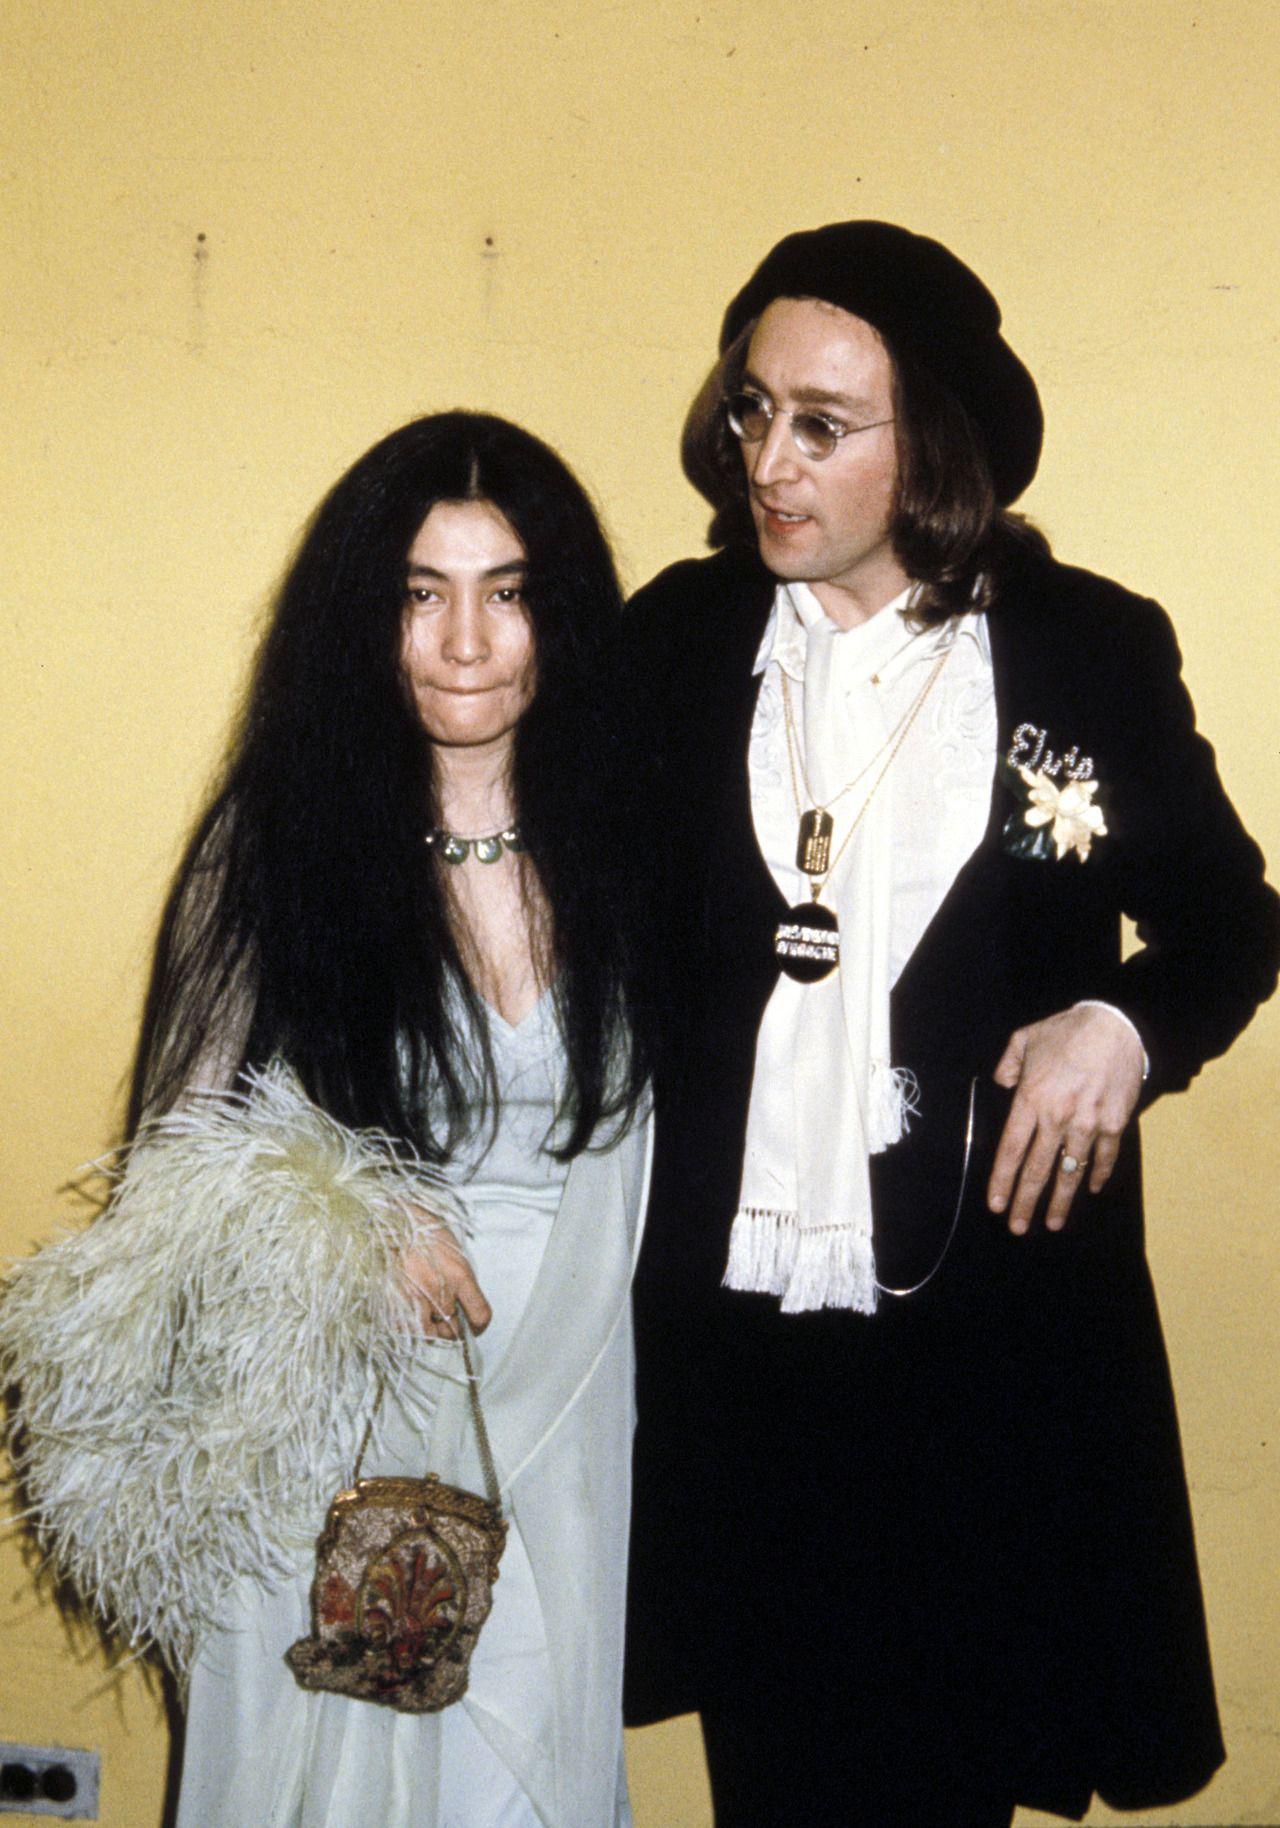 Twixnmix The Righteous Brothers David Bowie Yoko Ono John Lennon And Roberta Flack Backstage At The John Lennon And Yoko John Lennon John Lennon Yoko Ono